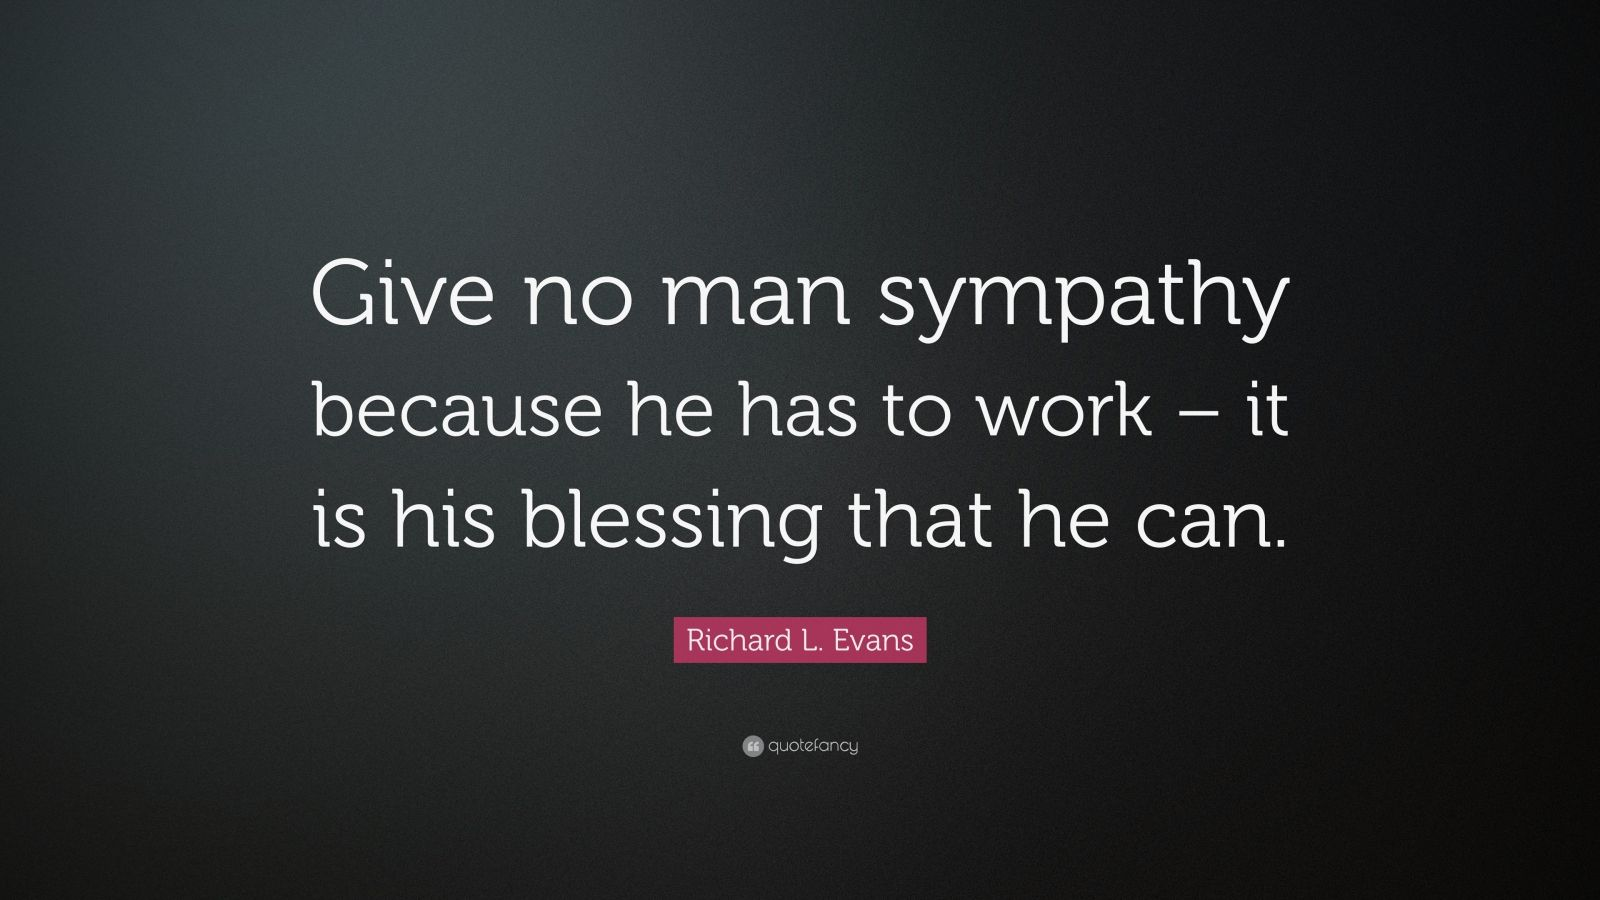 Richard l evans quote give no man sympathy because he has to work richard l evans quote give no man sympathy because he has to work thecheapjerseys Gallery